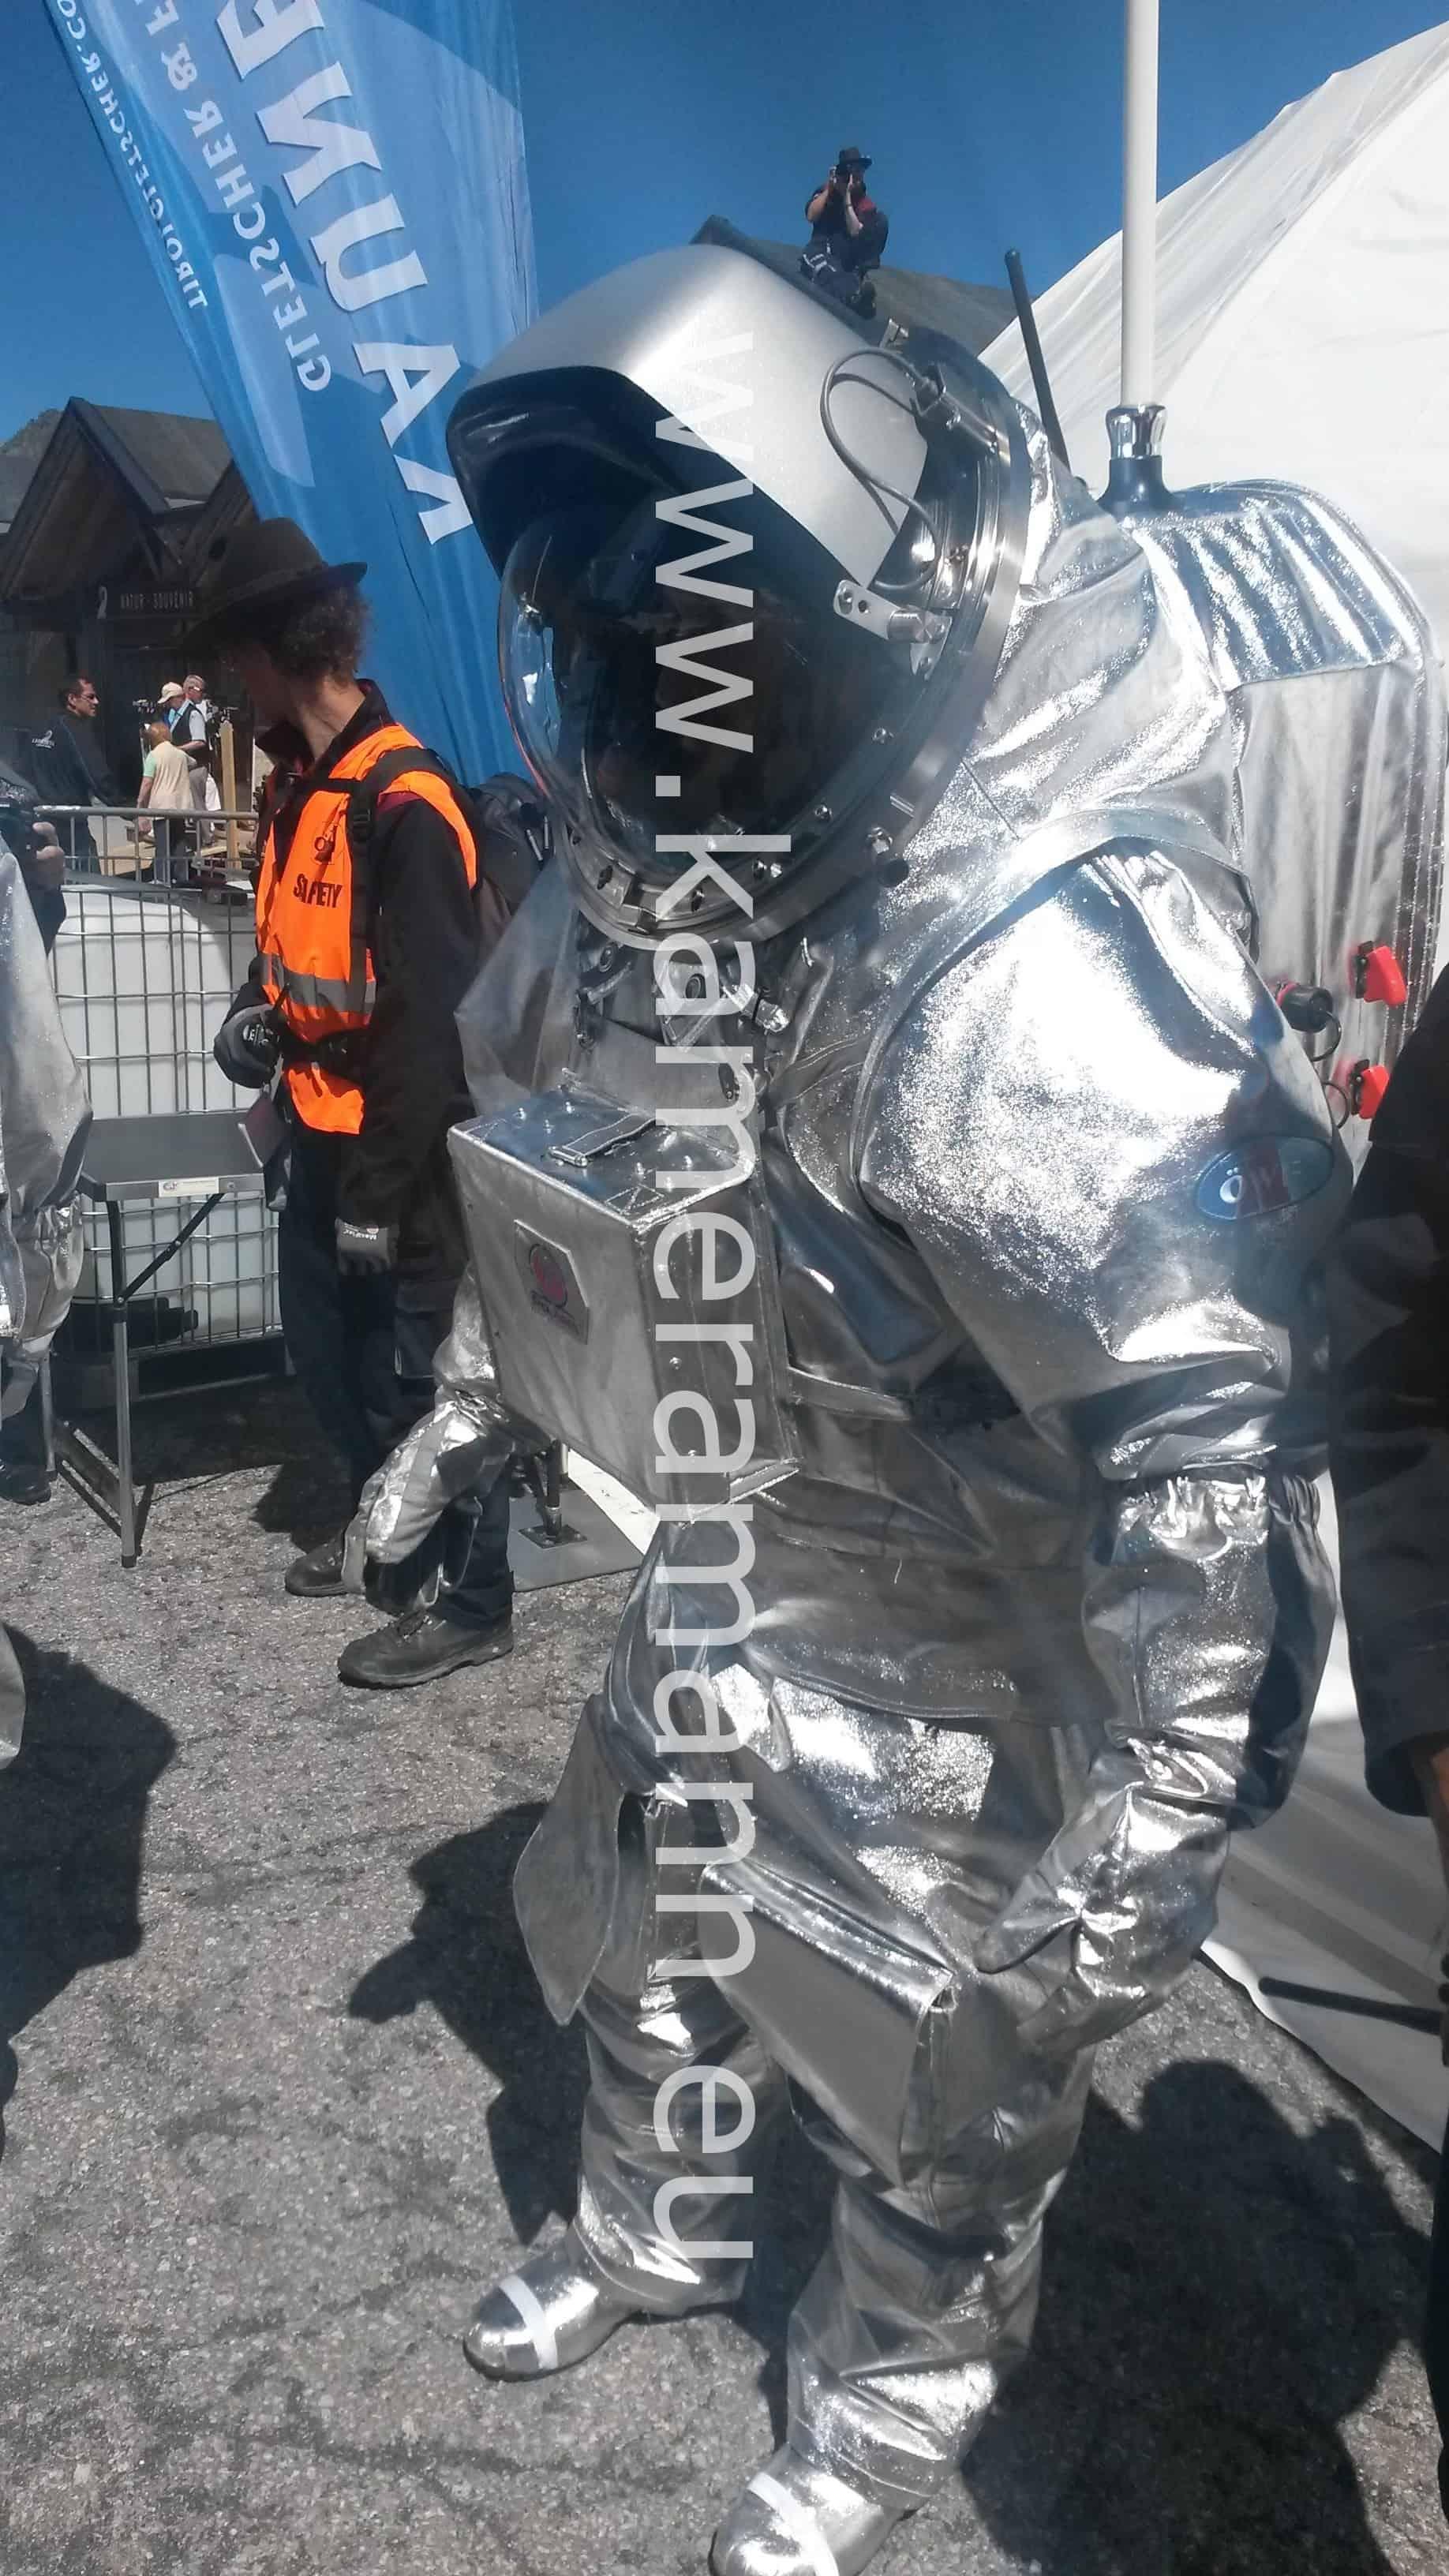 wpid 20150803 120223 e1438635083912 - ORF - Mars Simulation